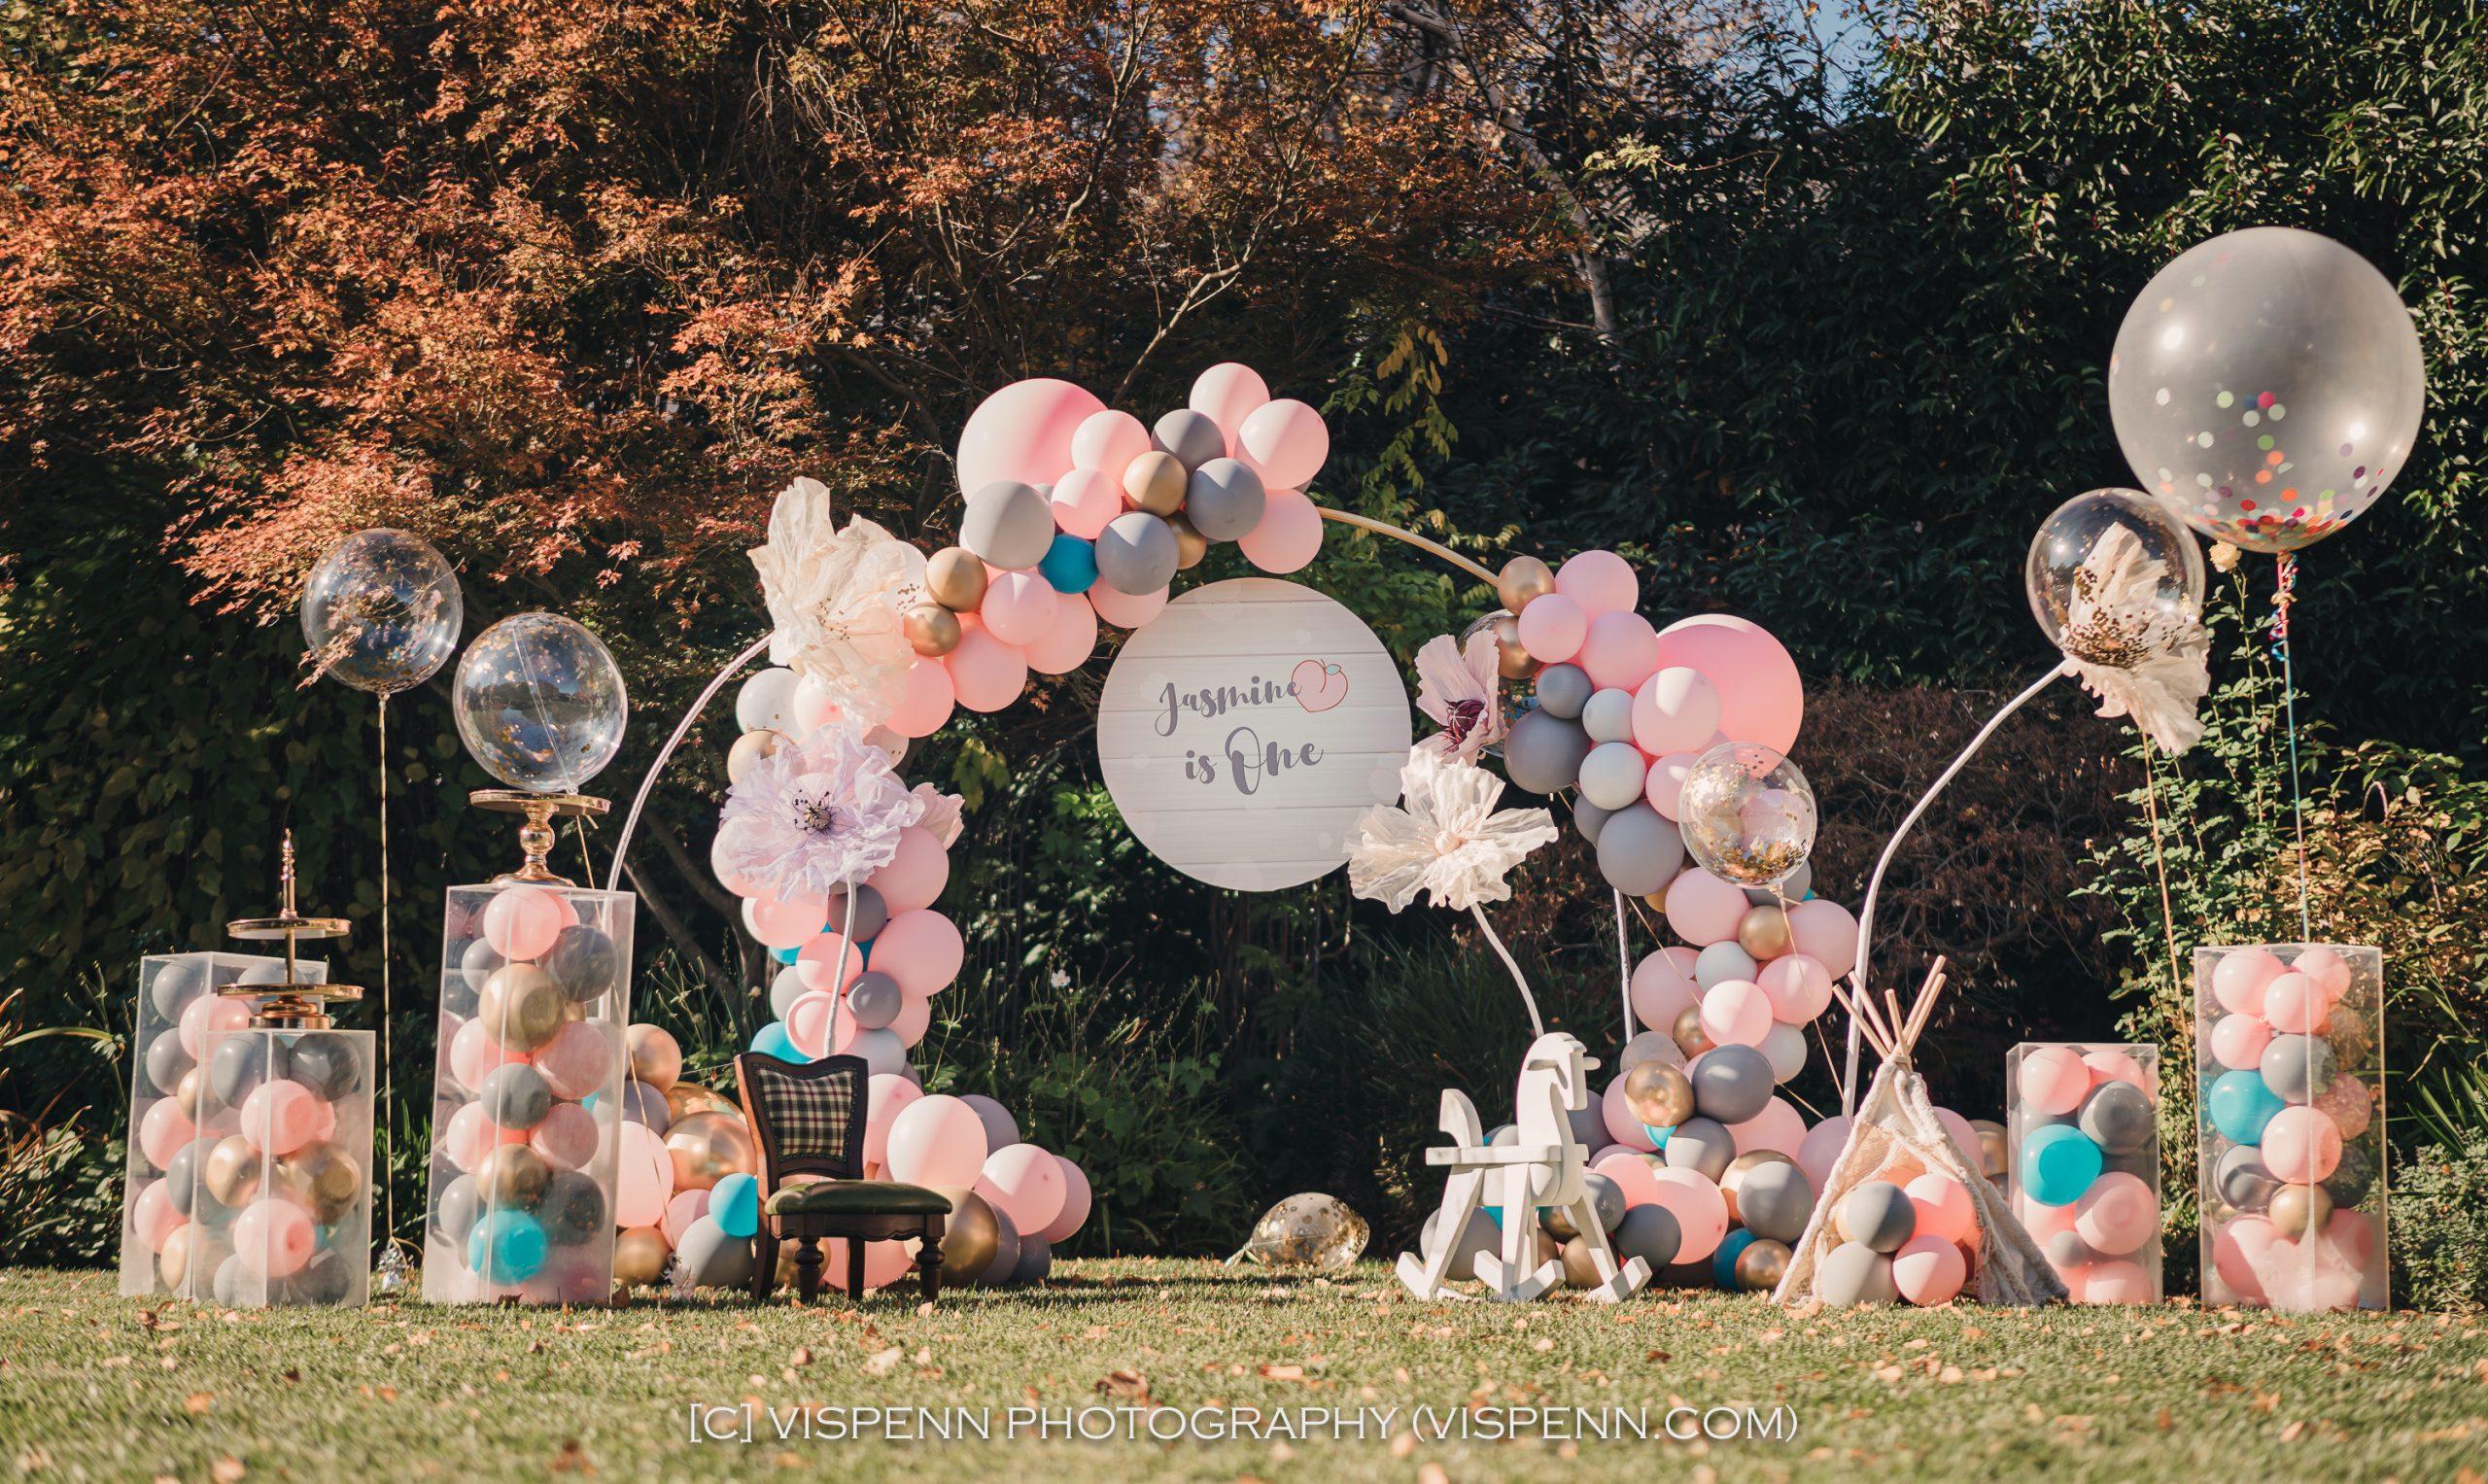 Melbourne Baby Family Birthday Party Photographer 墨尔本 百日宴 满月宴 周岁宴 摄影 VISPENN Jenny 0440 Sony VISPENN